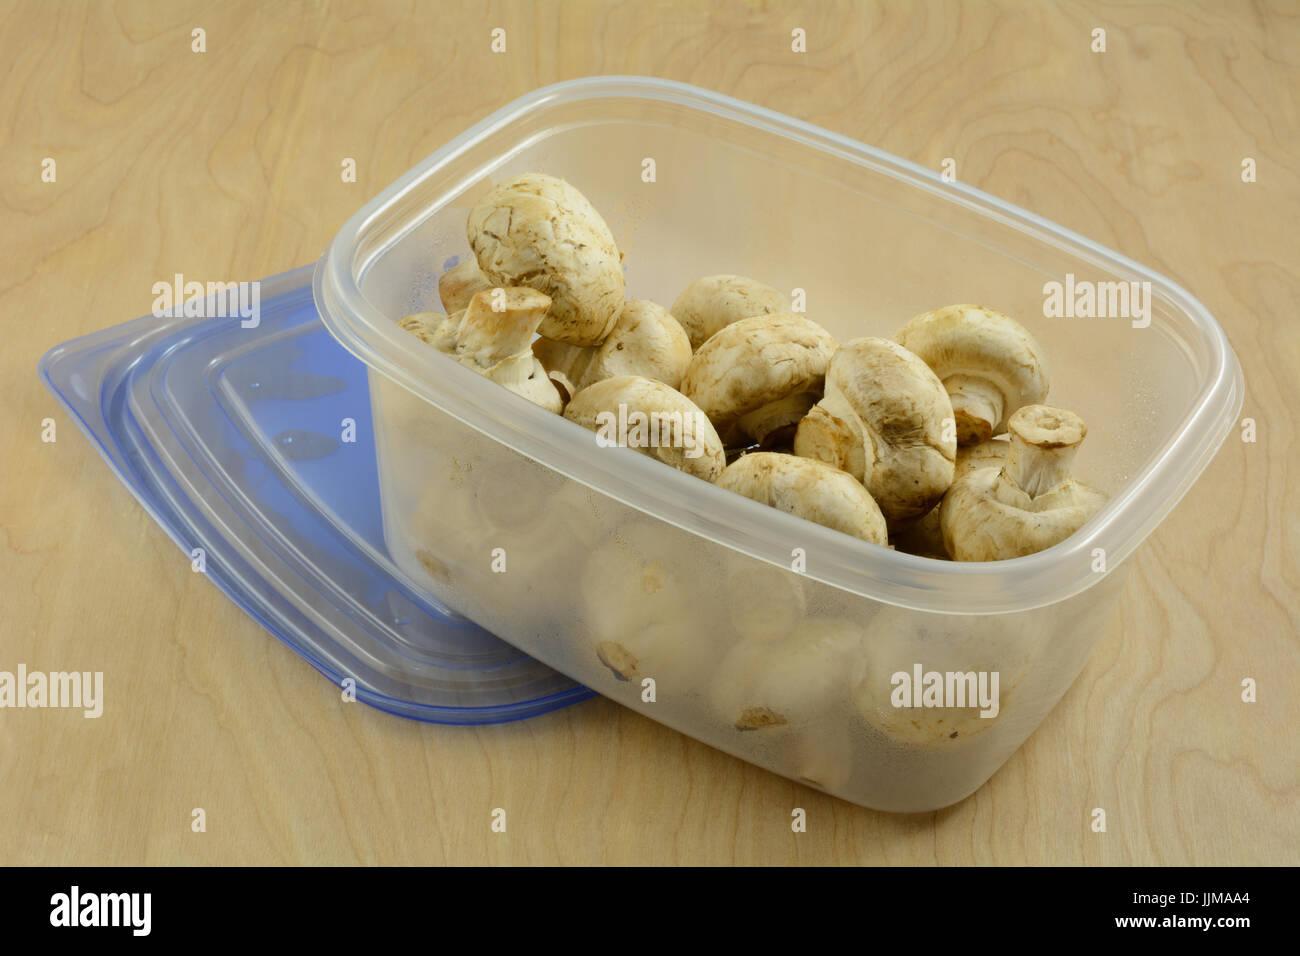 White button mushrooms in refrigerator plastic storage container